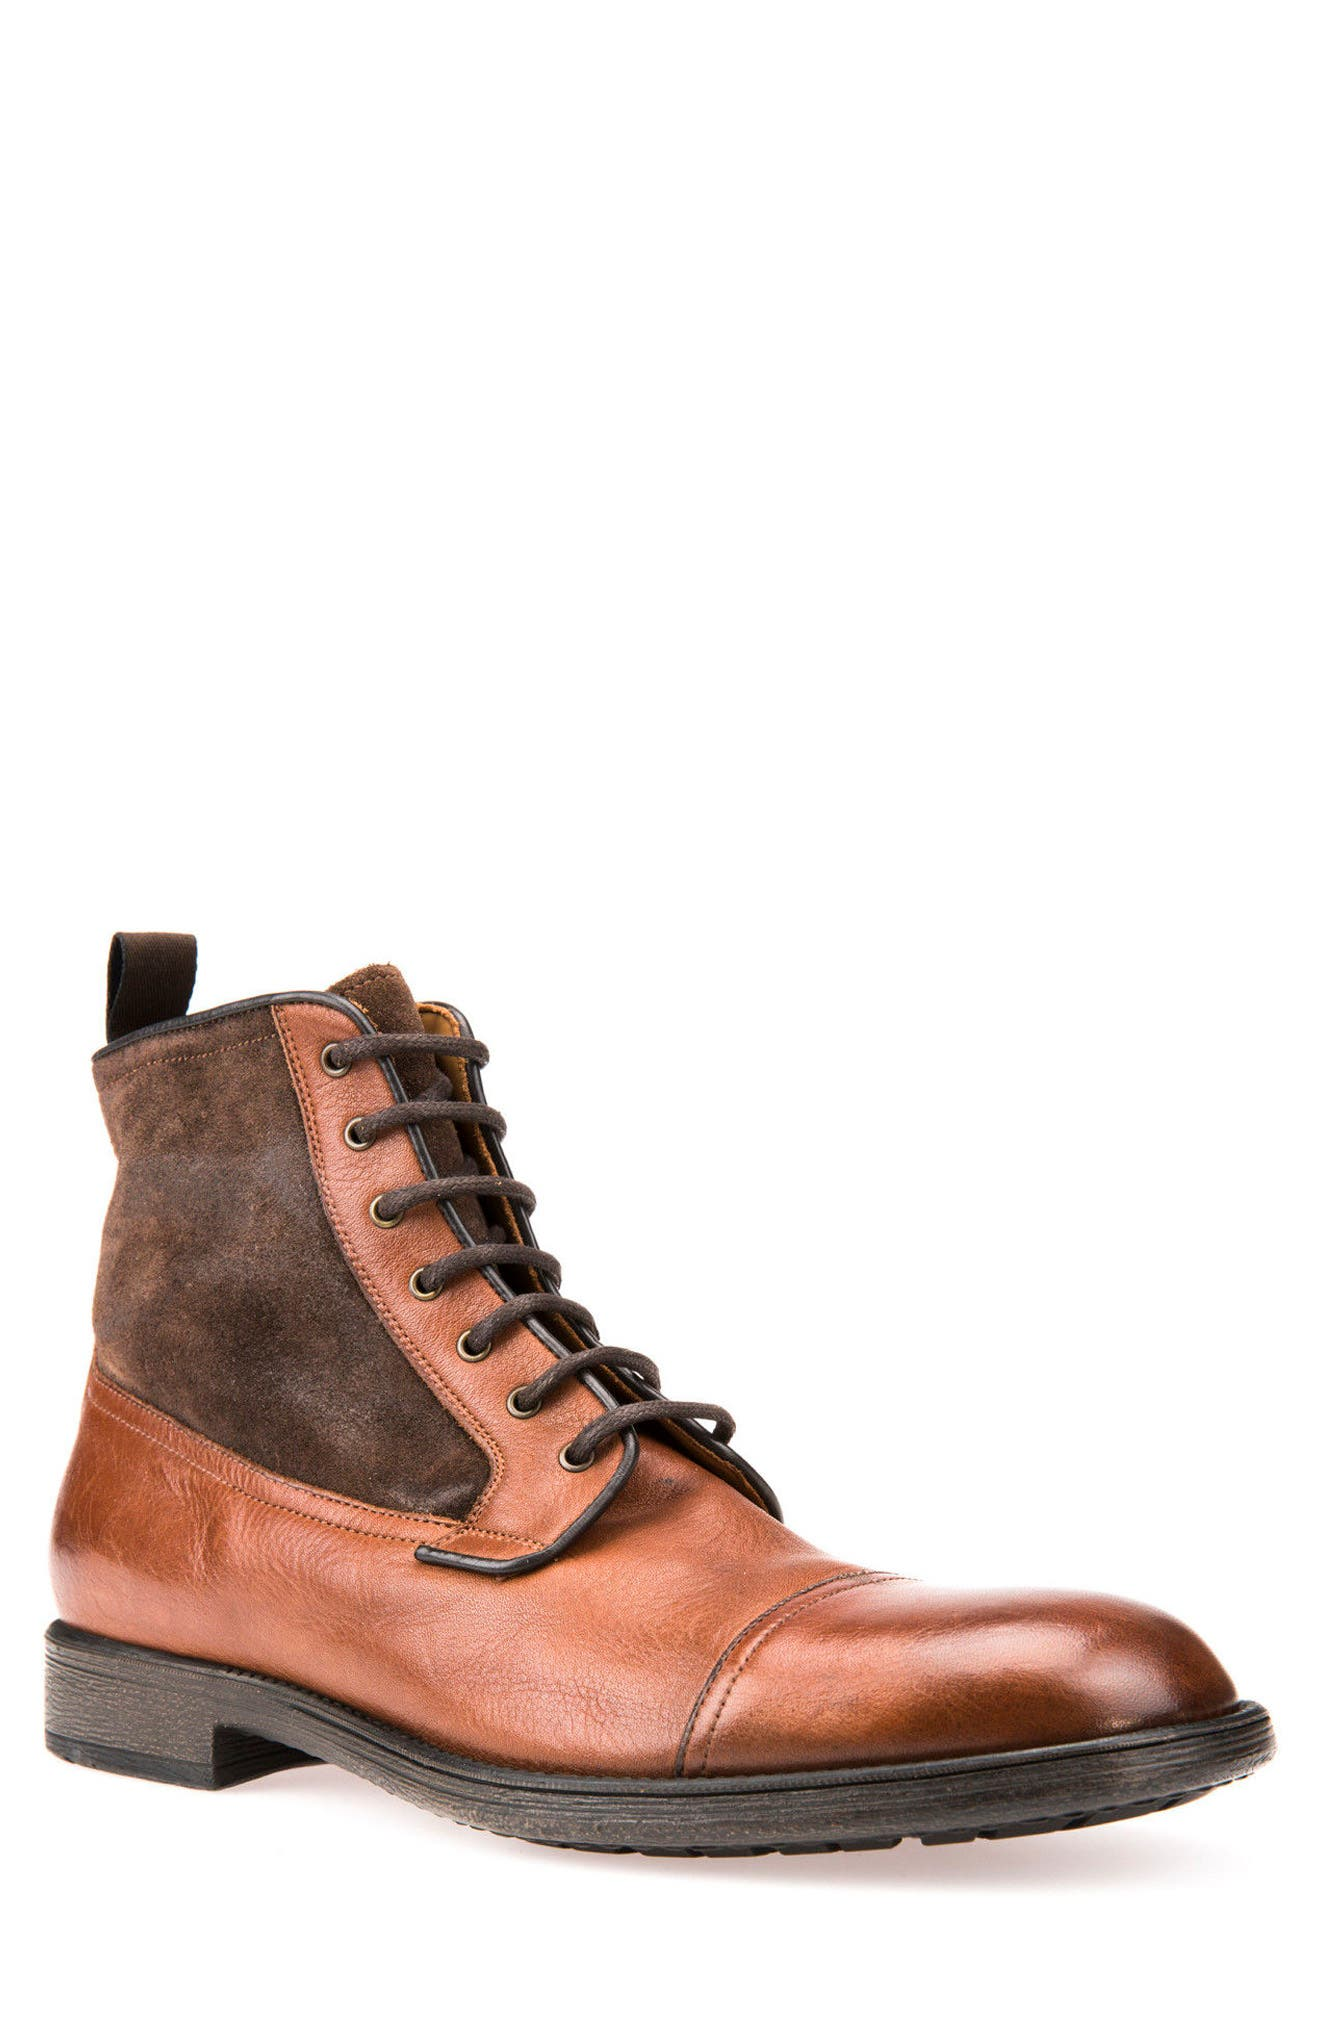 Jaylon 12 Cap-Toe Boot,                         Main,                         color, Ebony